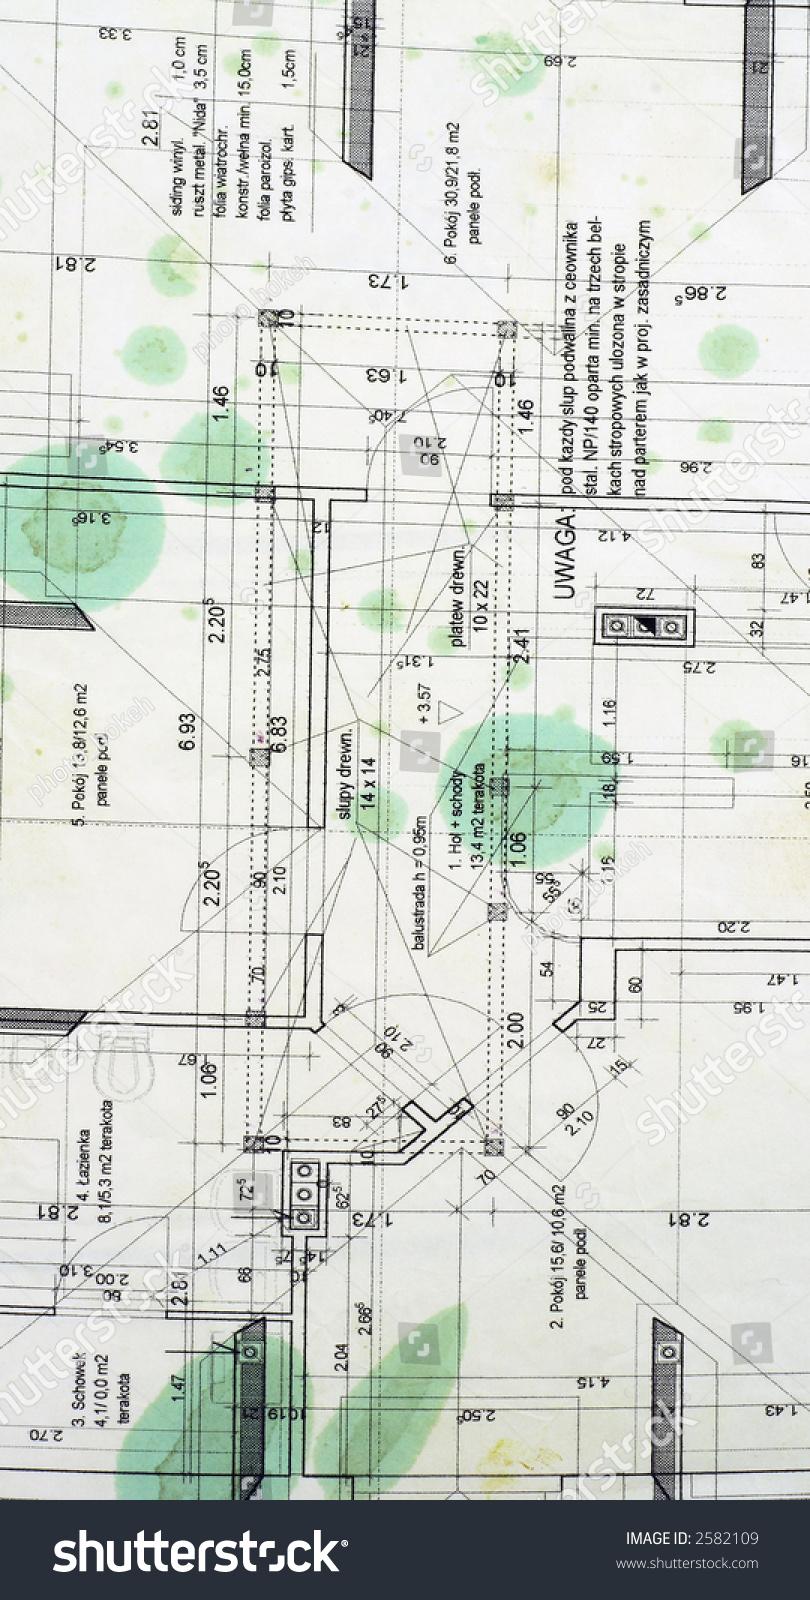 Old blueprint stock photo royalty free 2582109 shutterstock old blueprint malvernweather Images